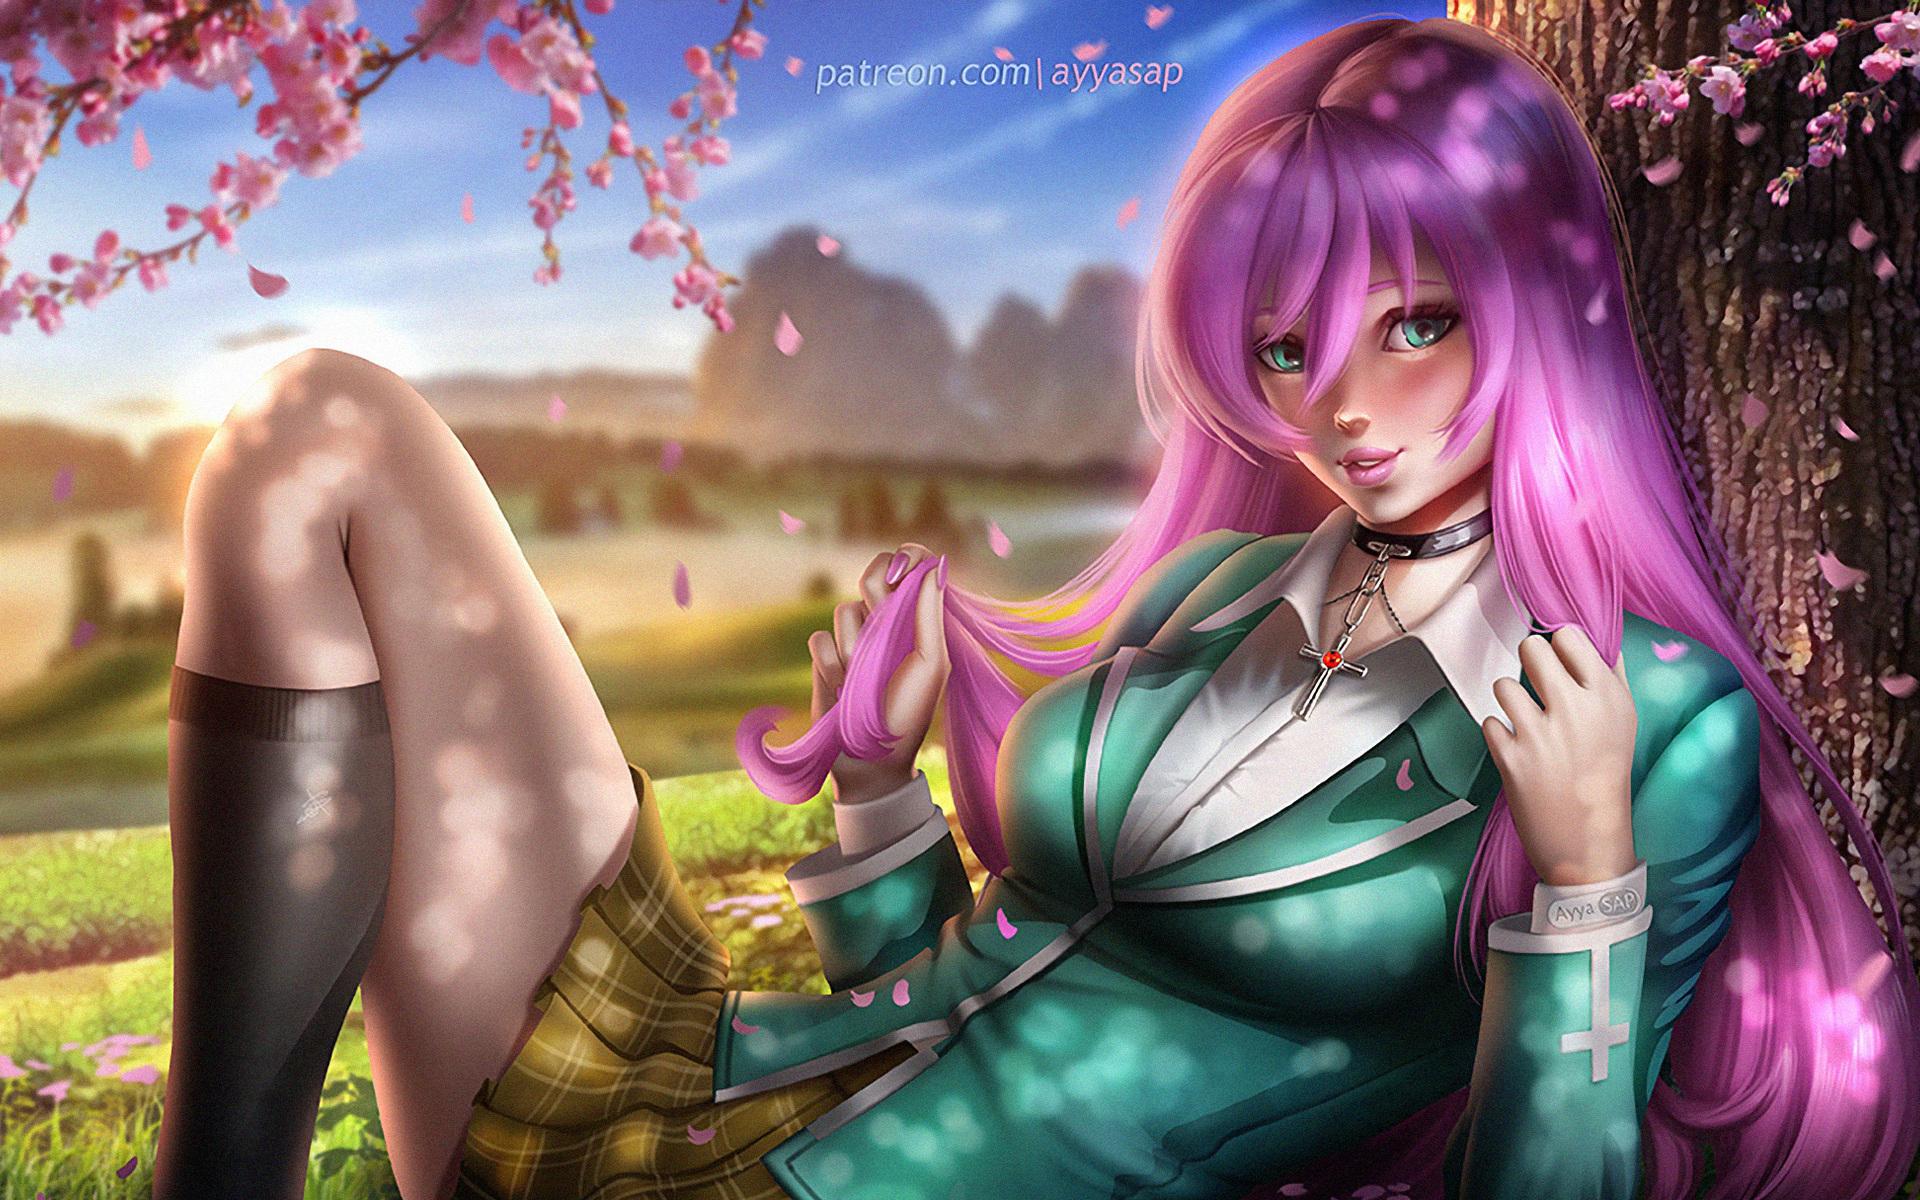 Wallpaper : 1080x1200 px, anime girls 1080x1200 - wallup